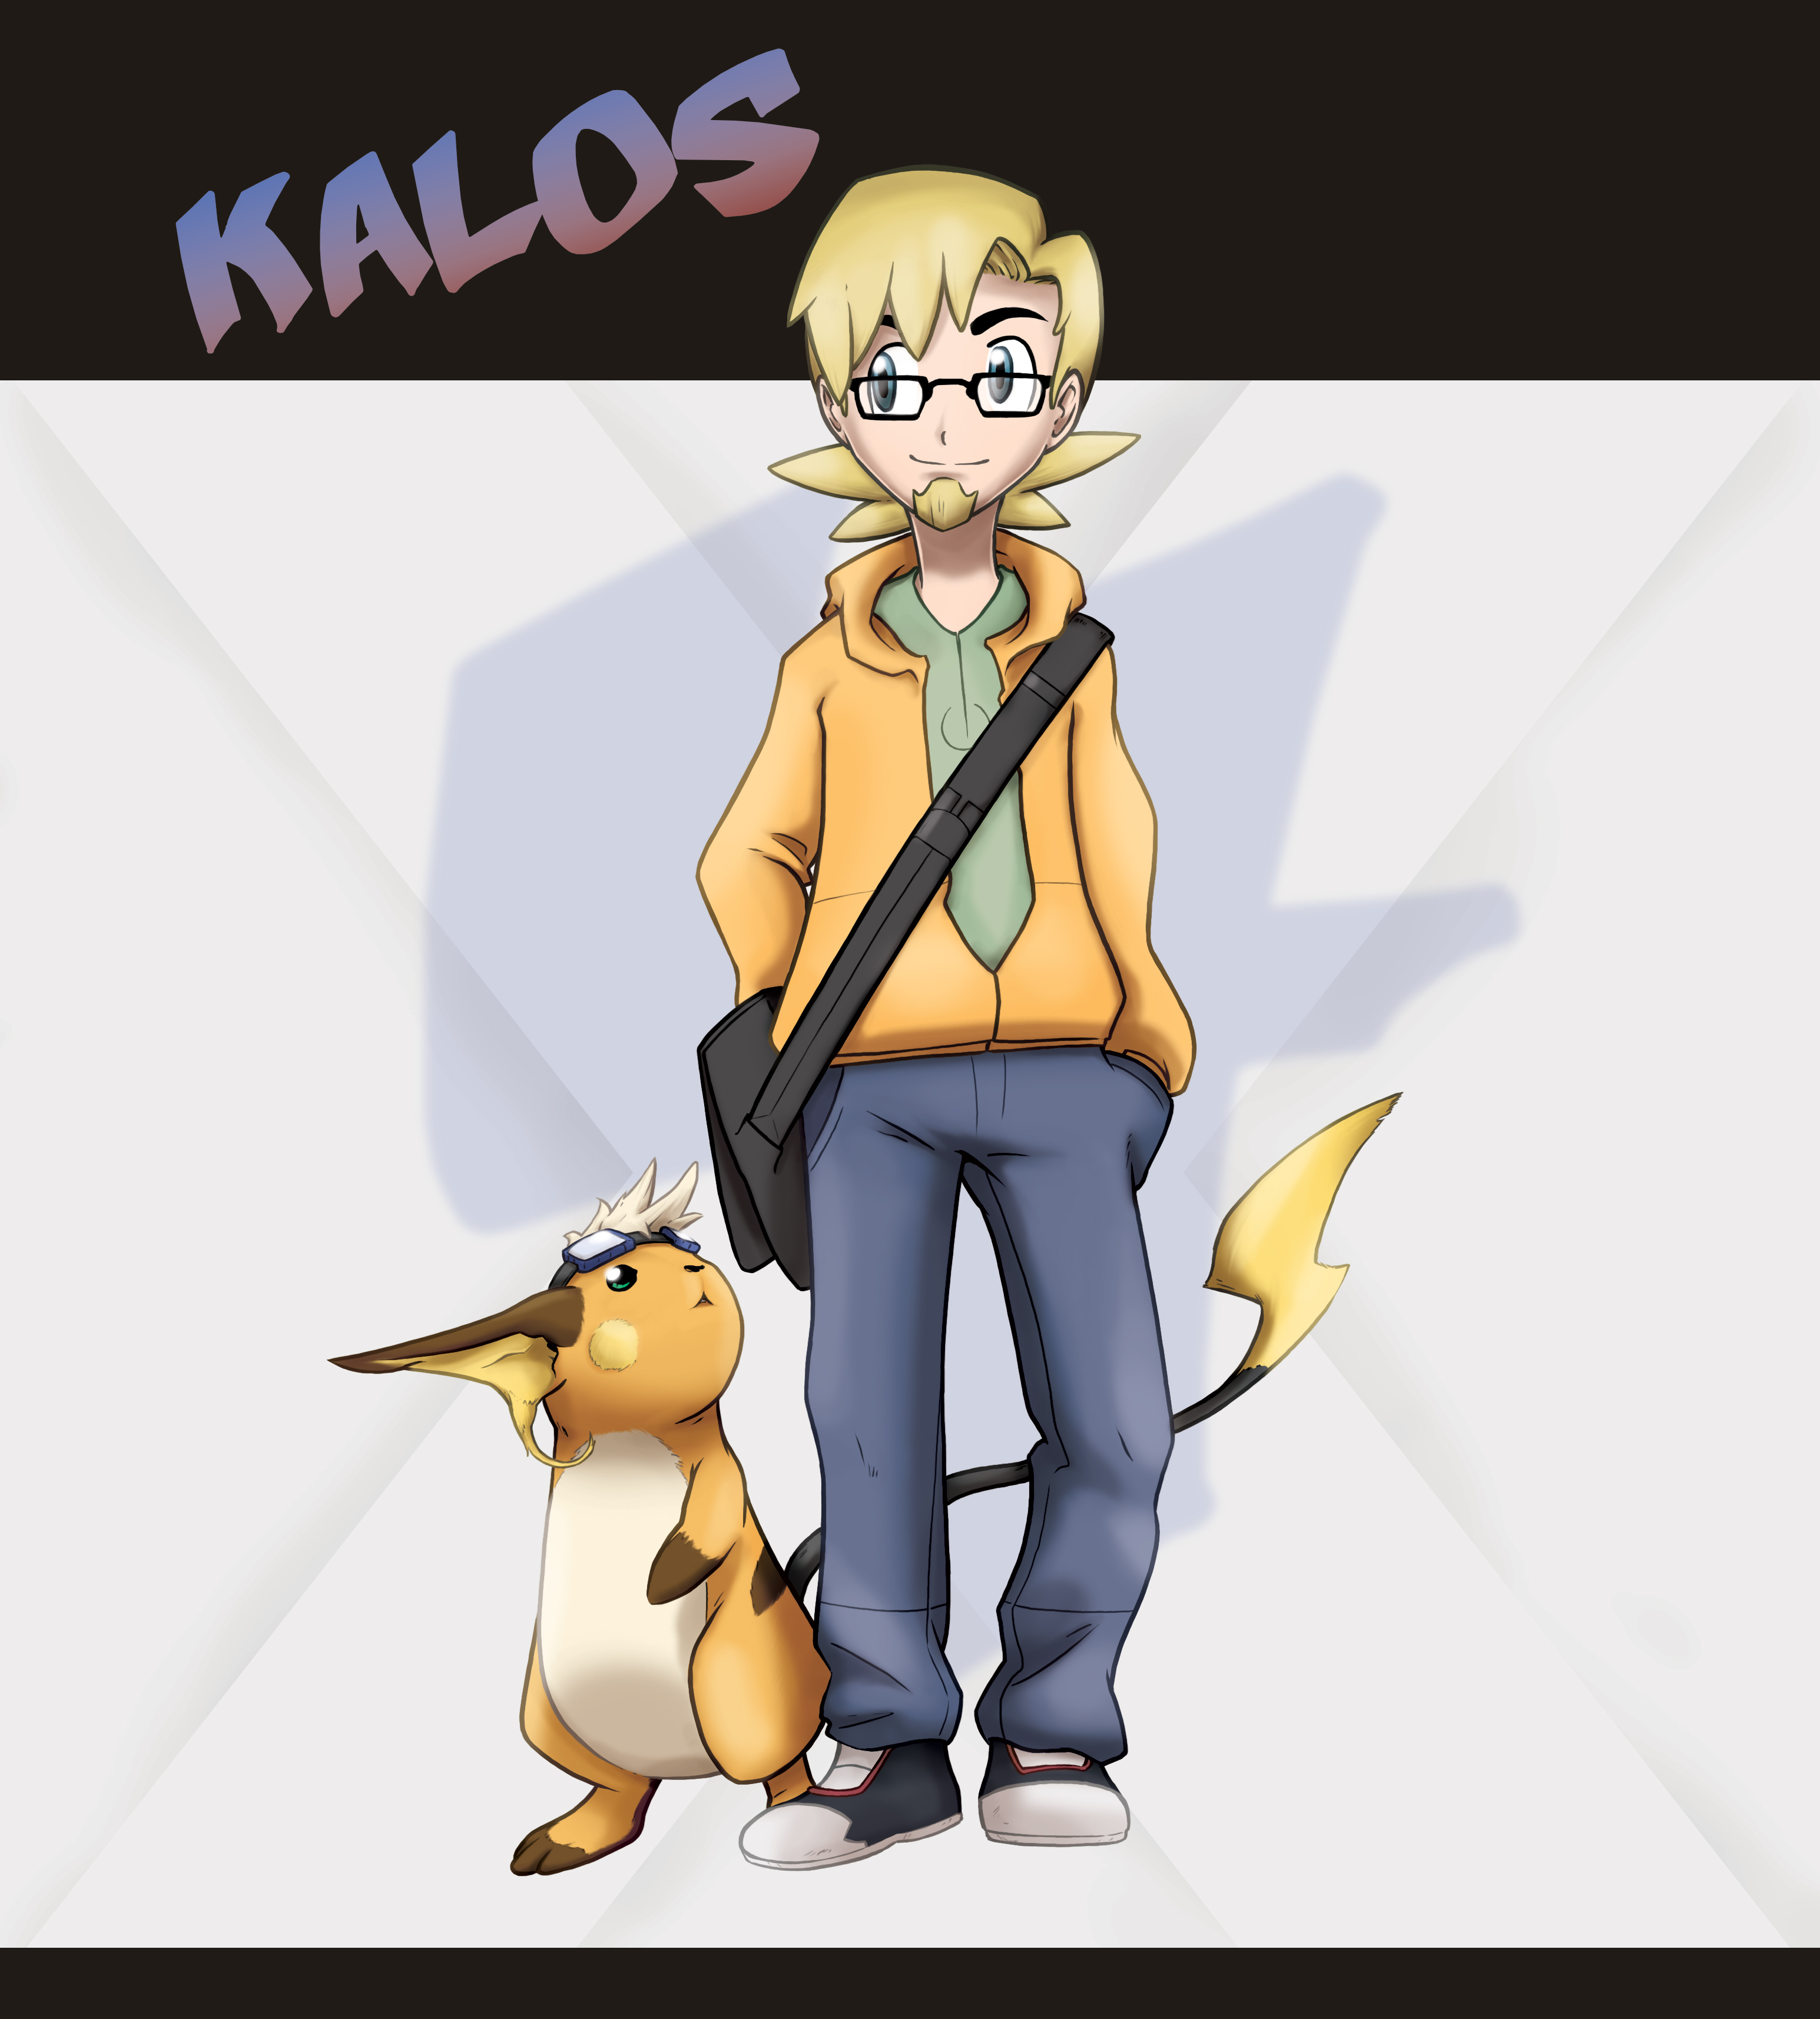 Pokémon - Kalos